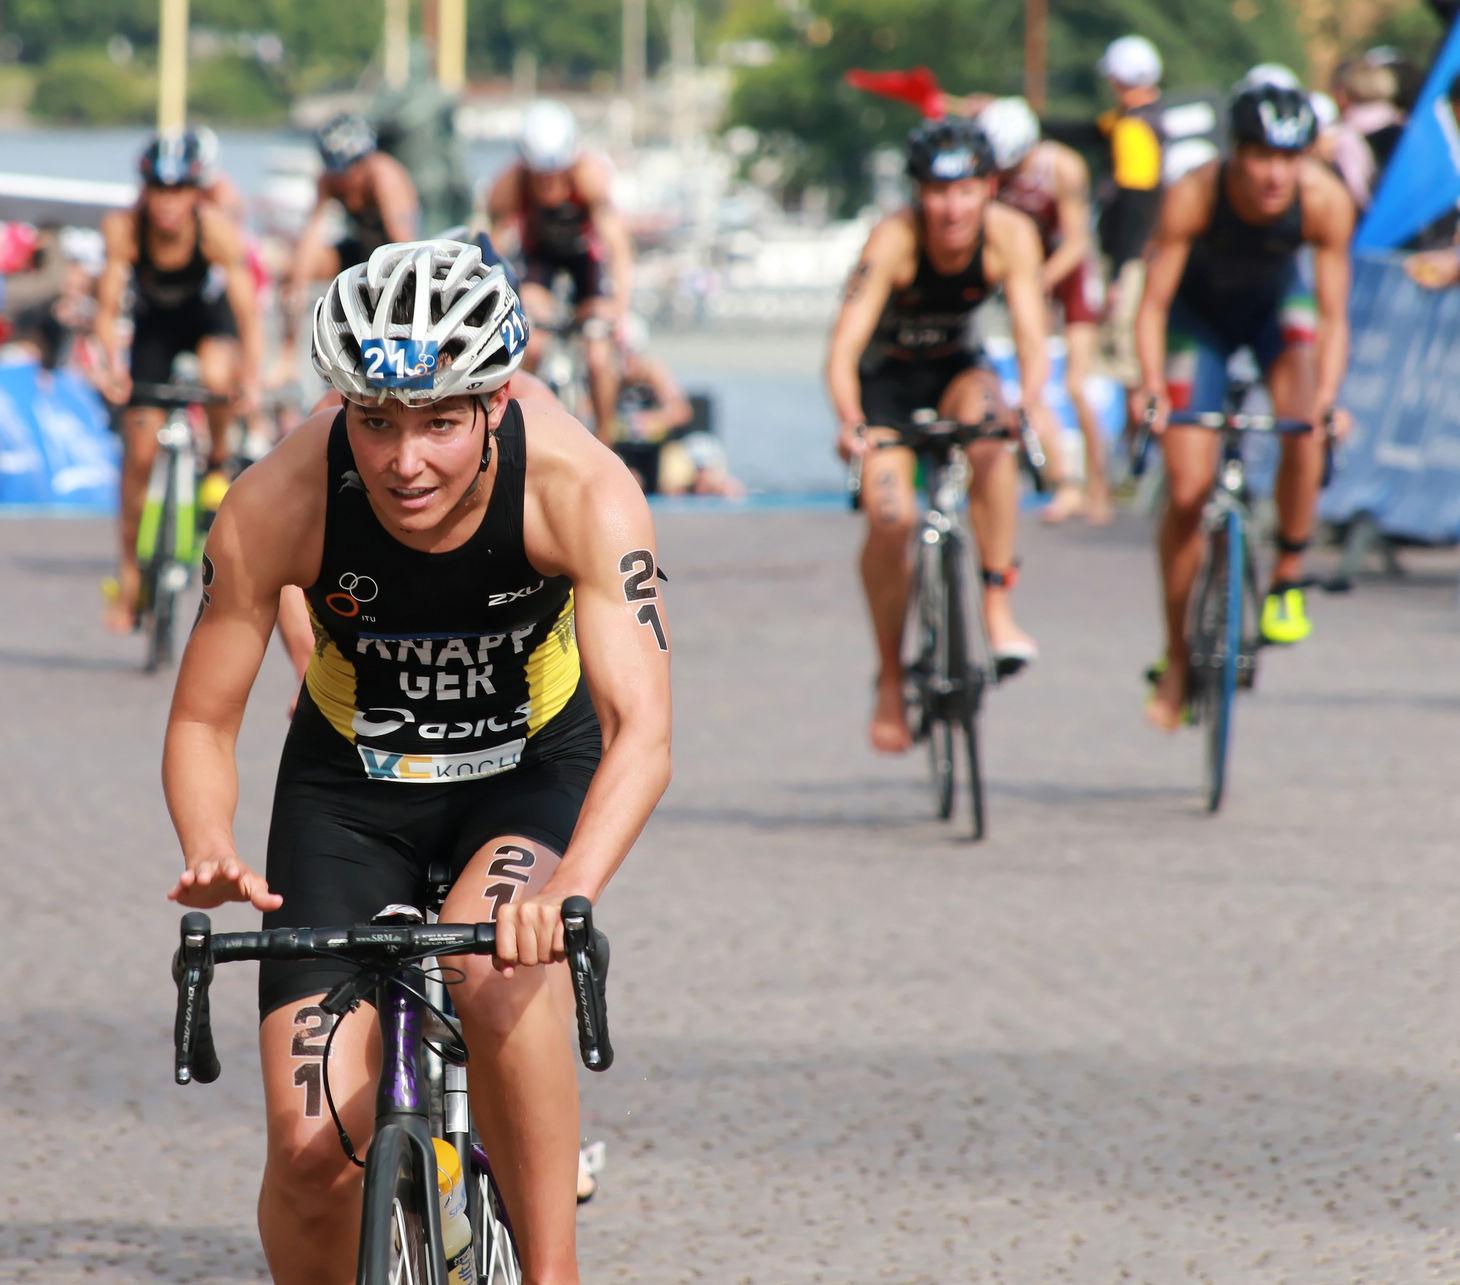 Triathletes cycling